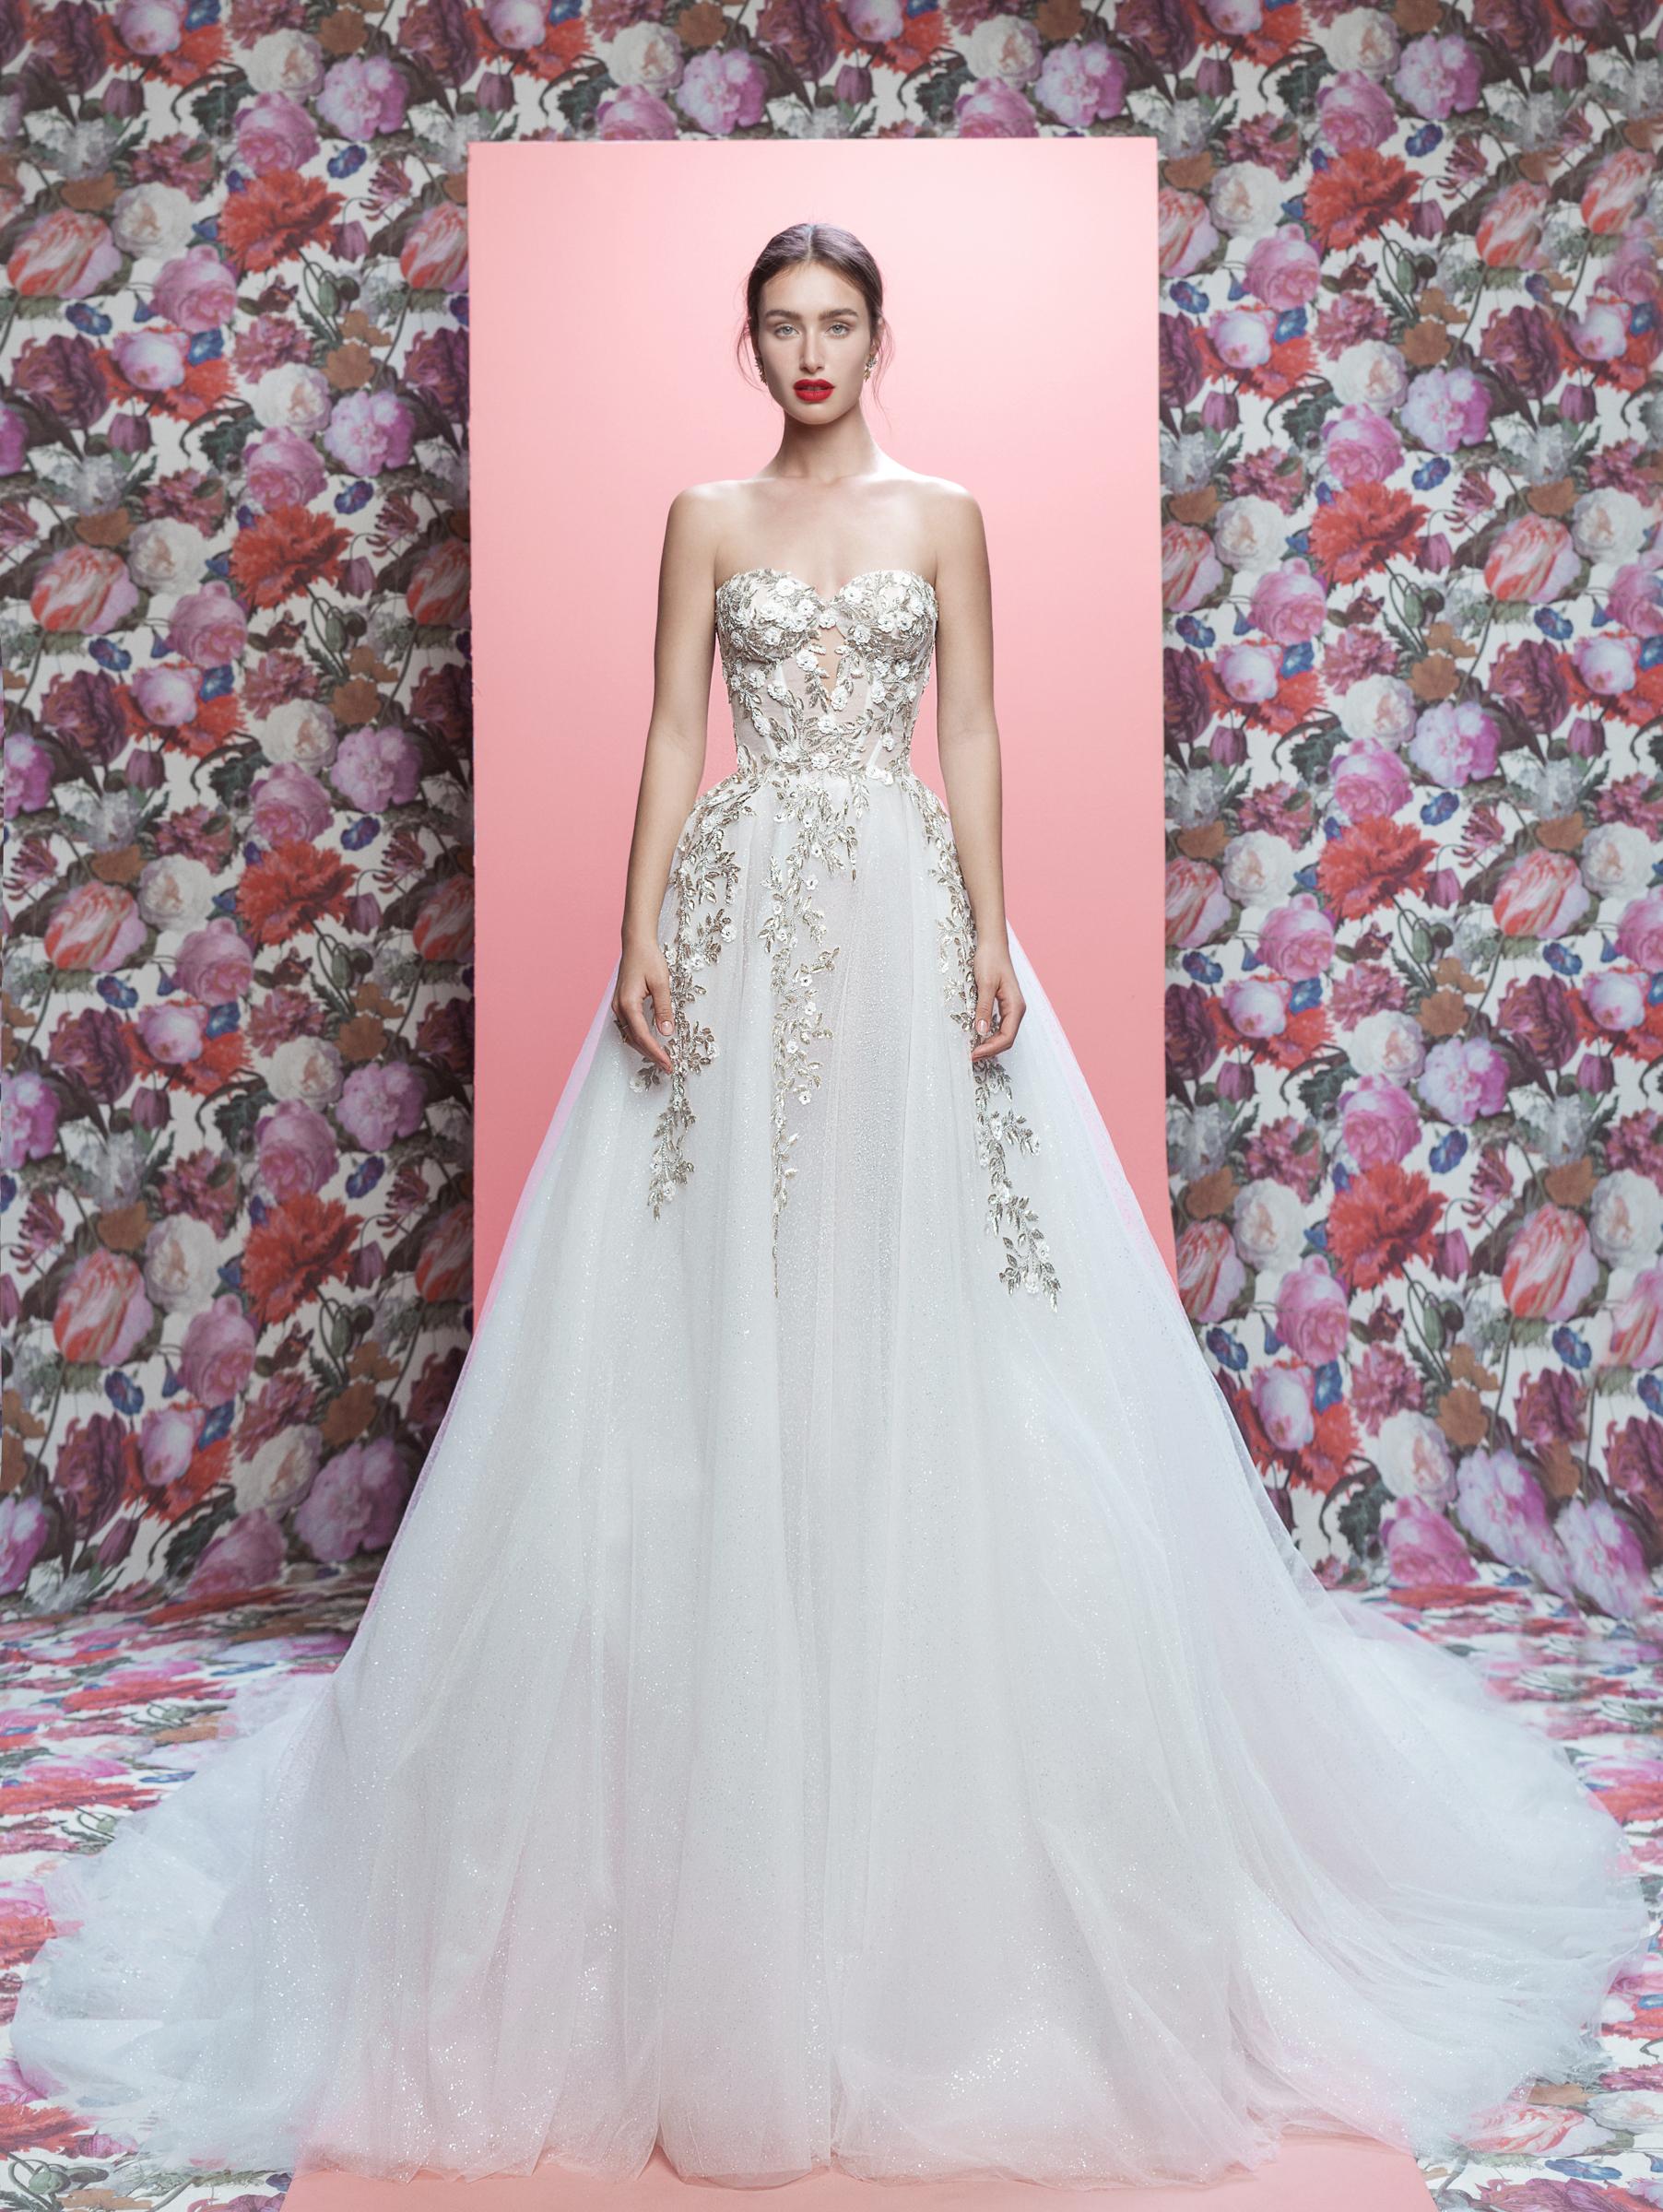 Galia Lahav wedding dress spring 2019 sparkly strapless a-line